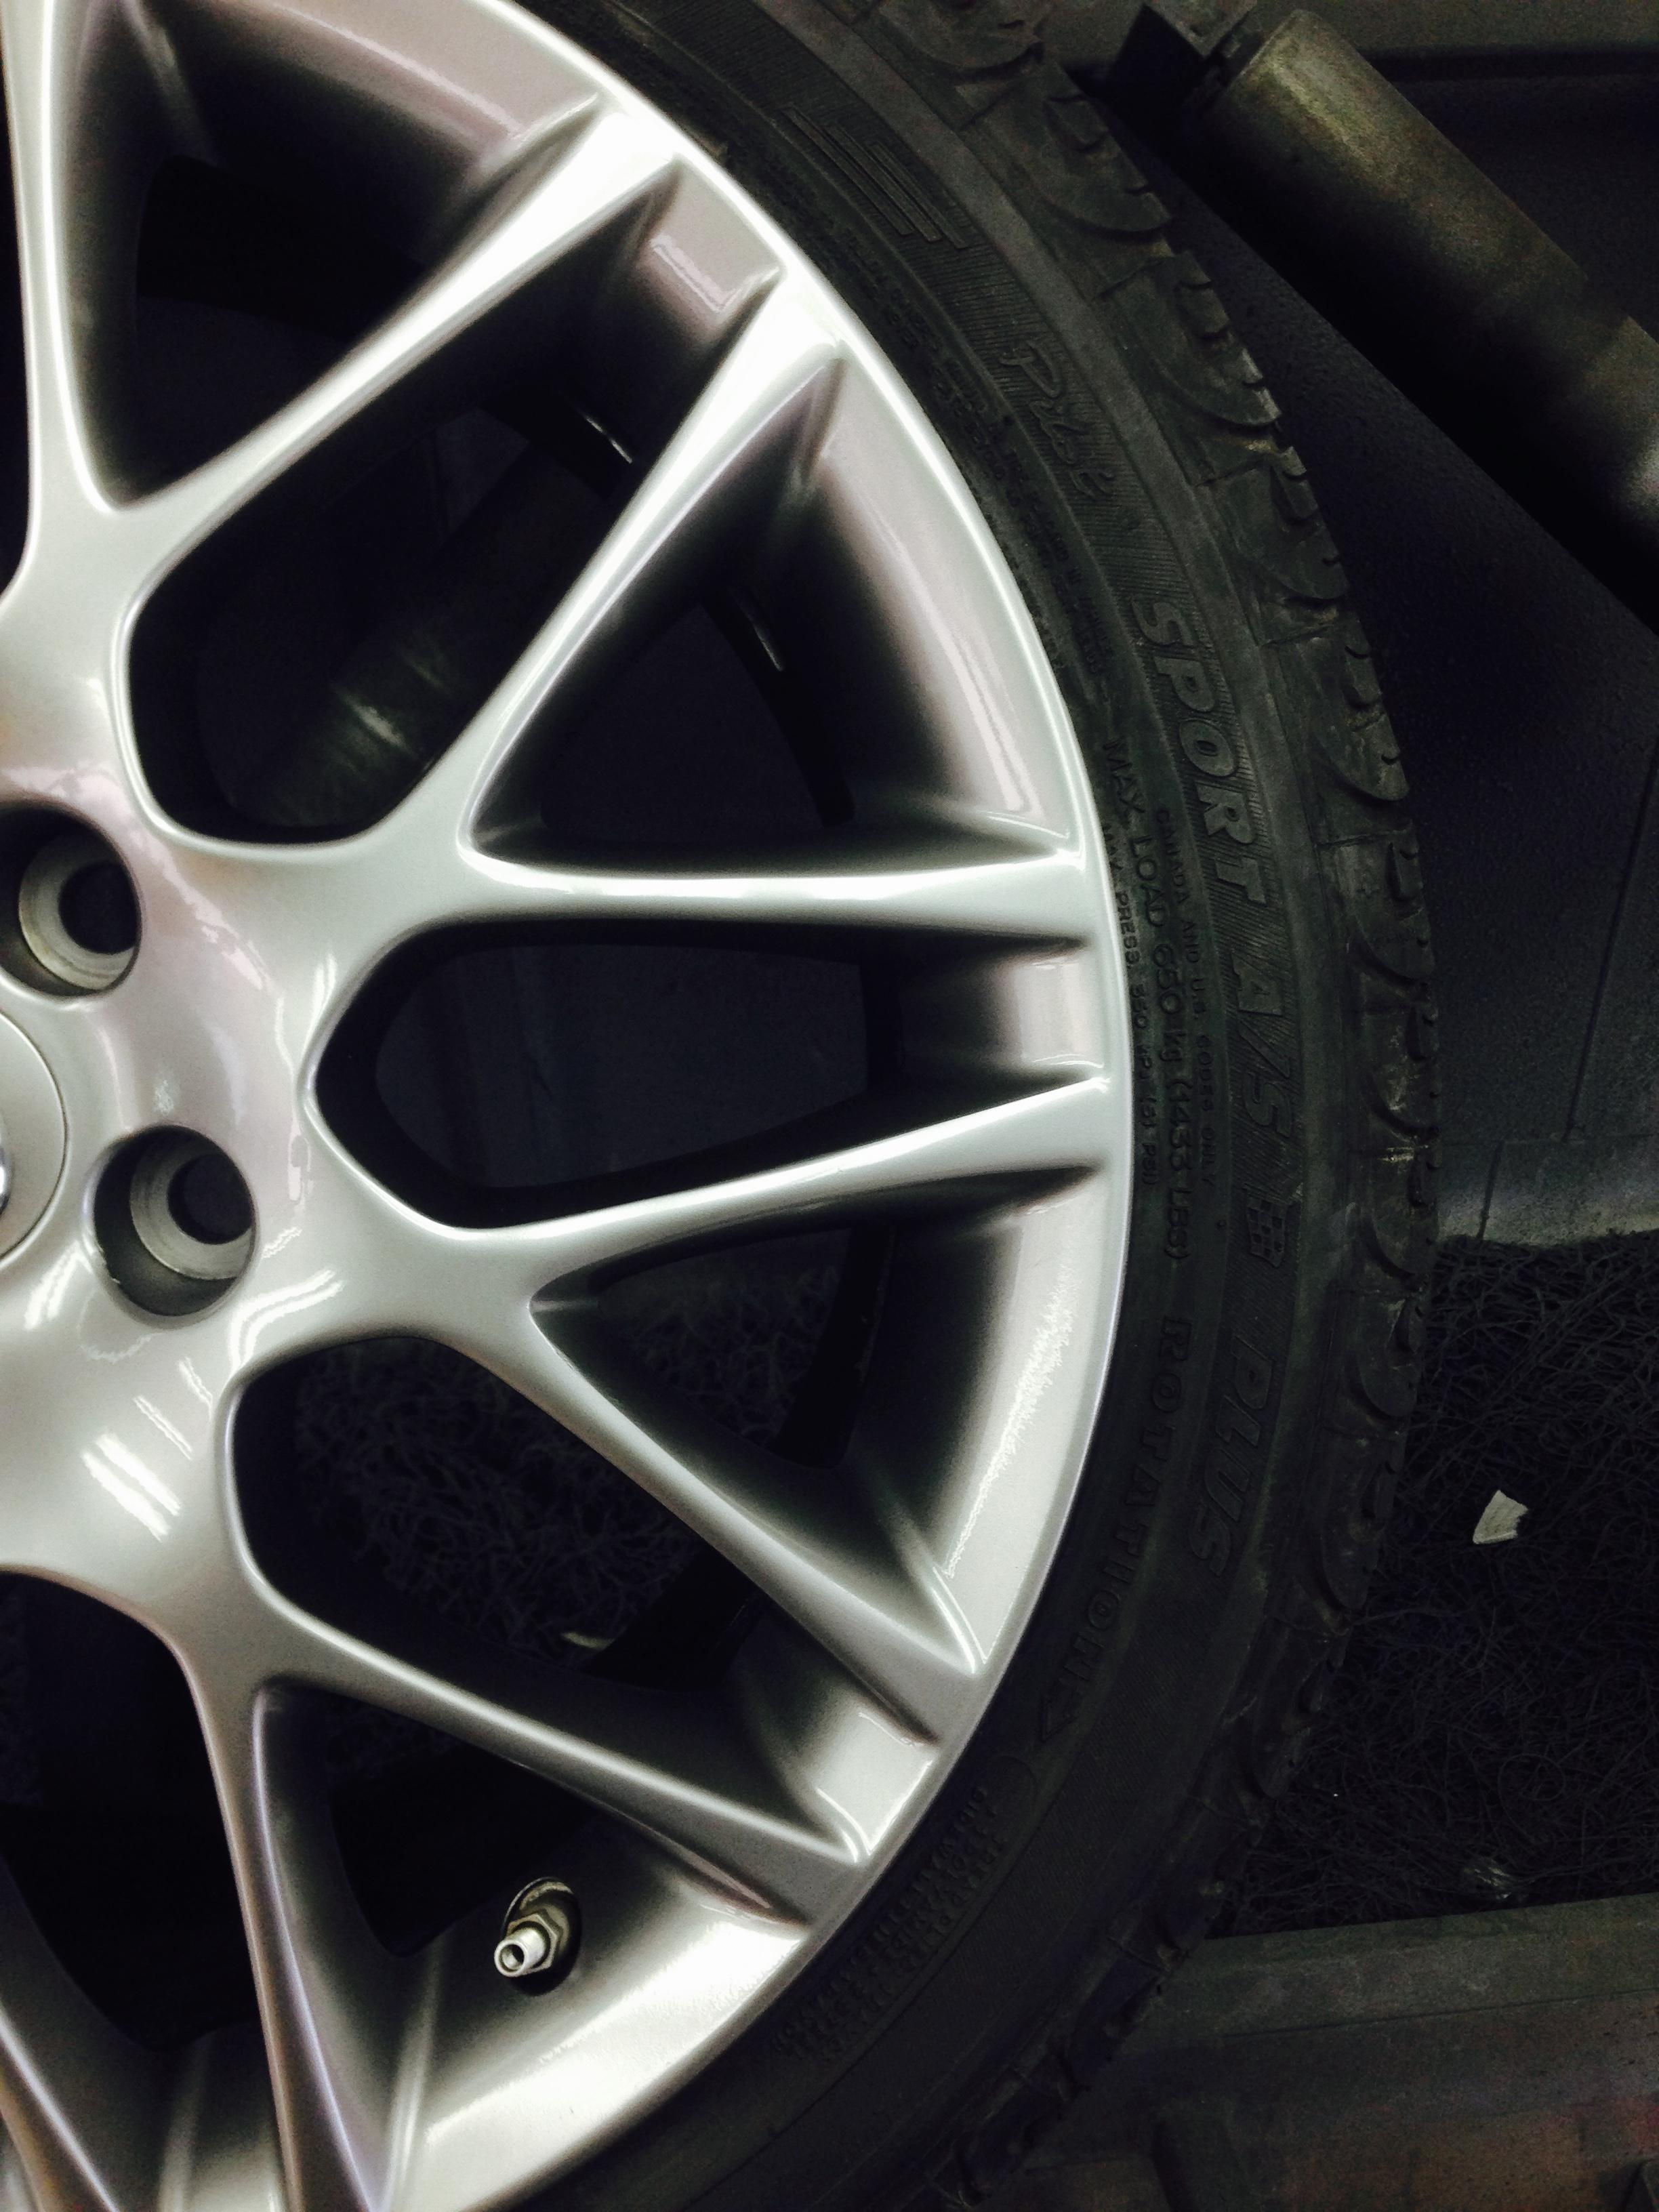 Curb rash after wheel repair & painting